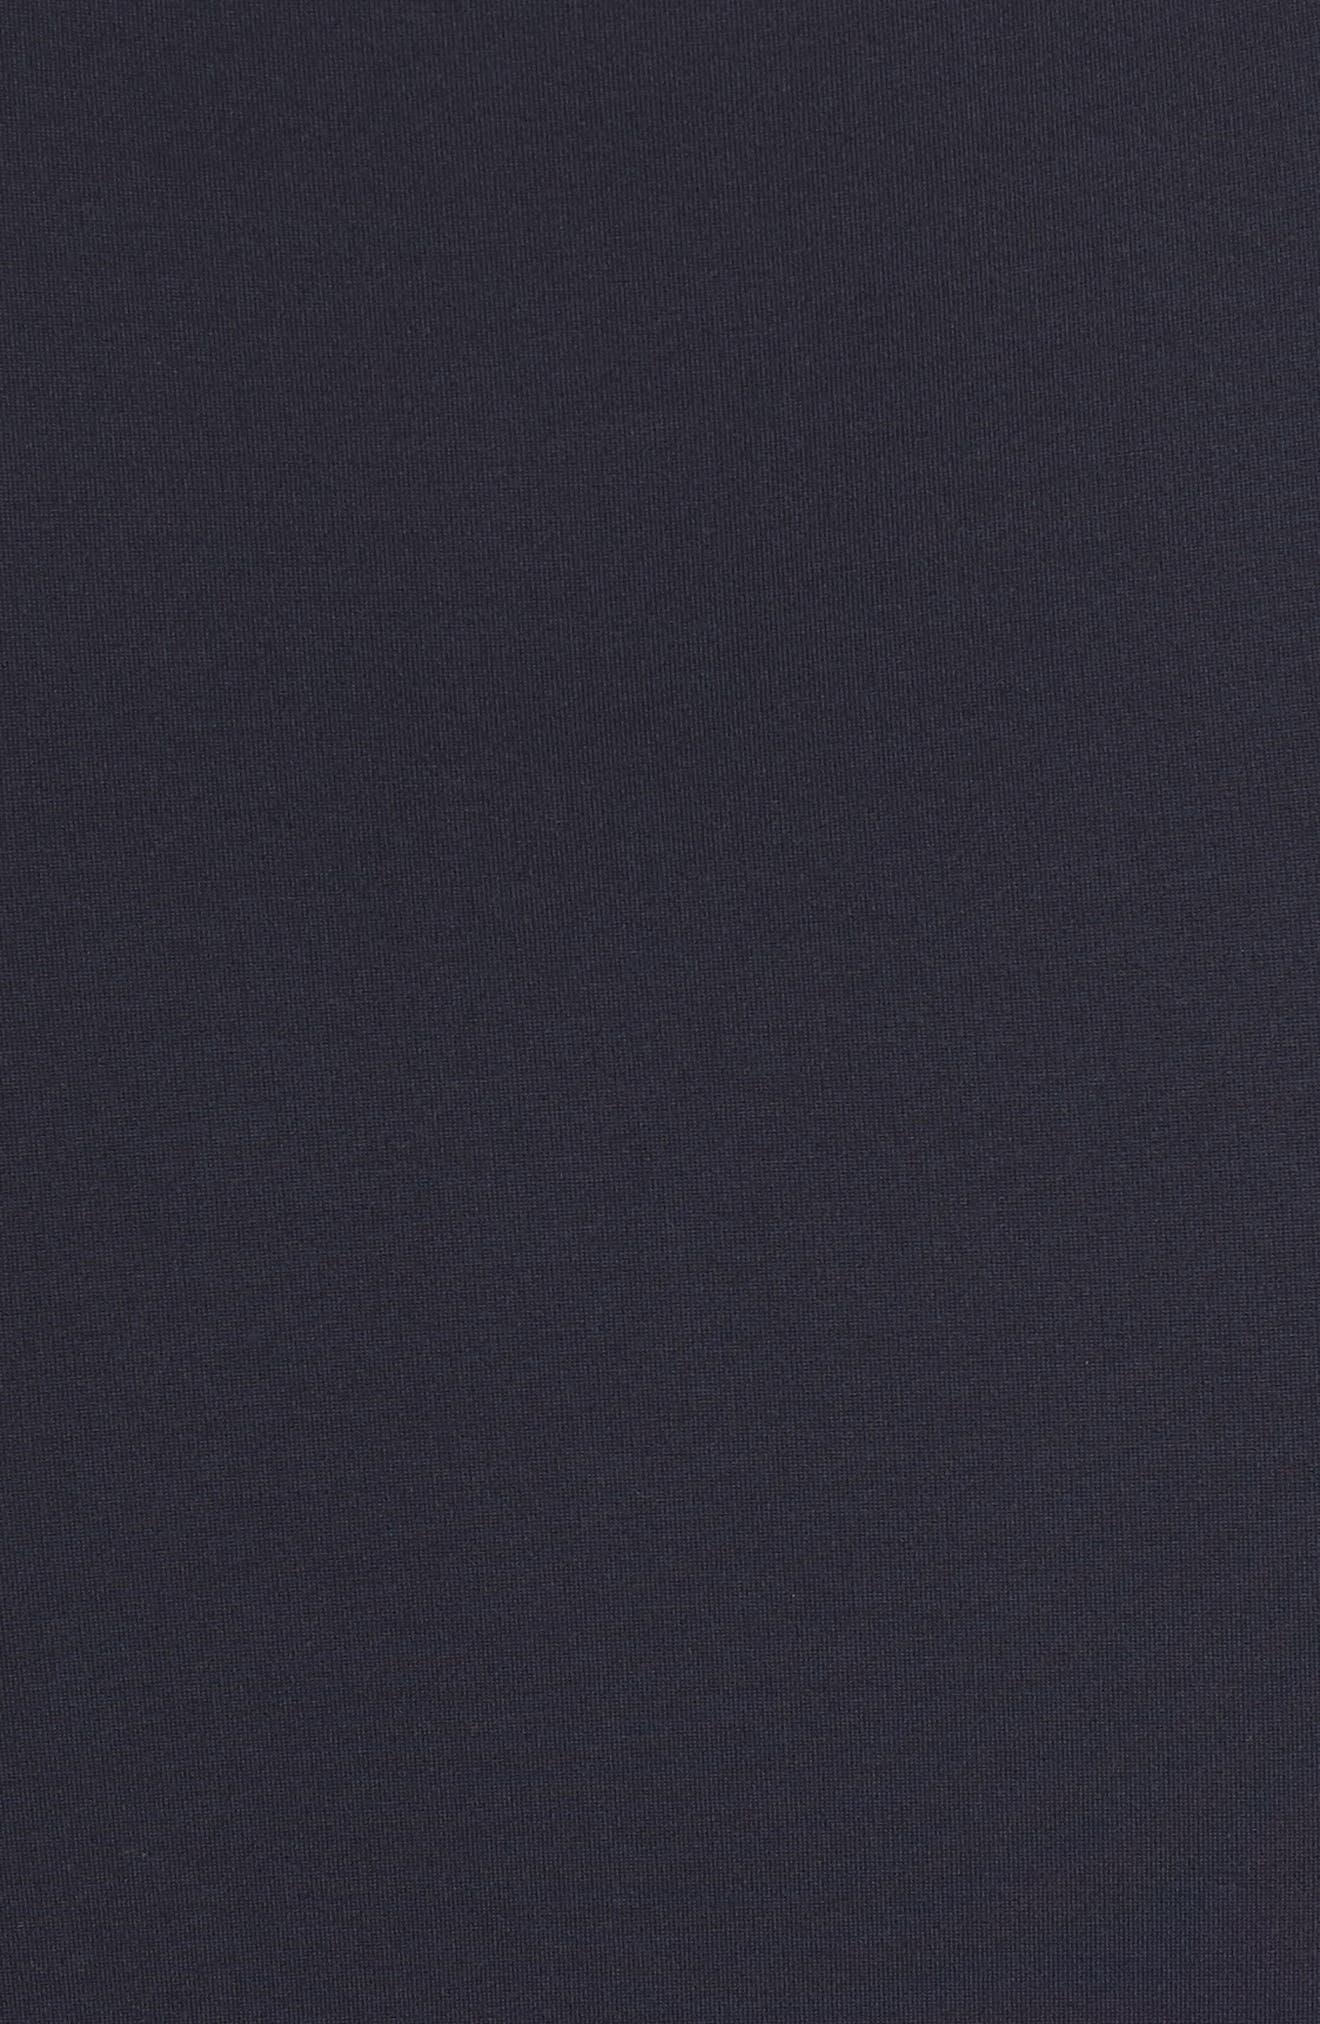 Maile Sheath Dress,                             Alternate thumbnail 5, color,                             400